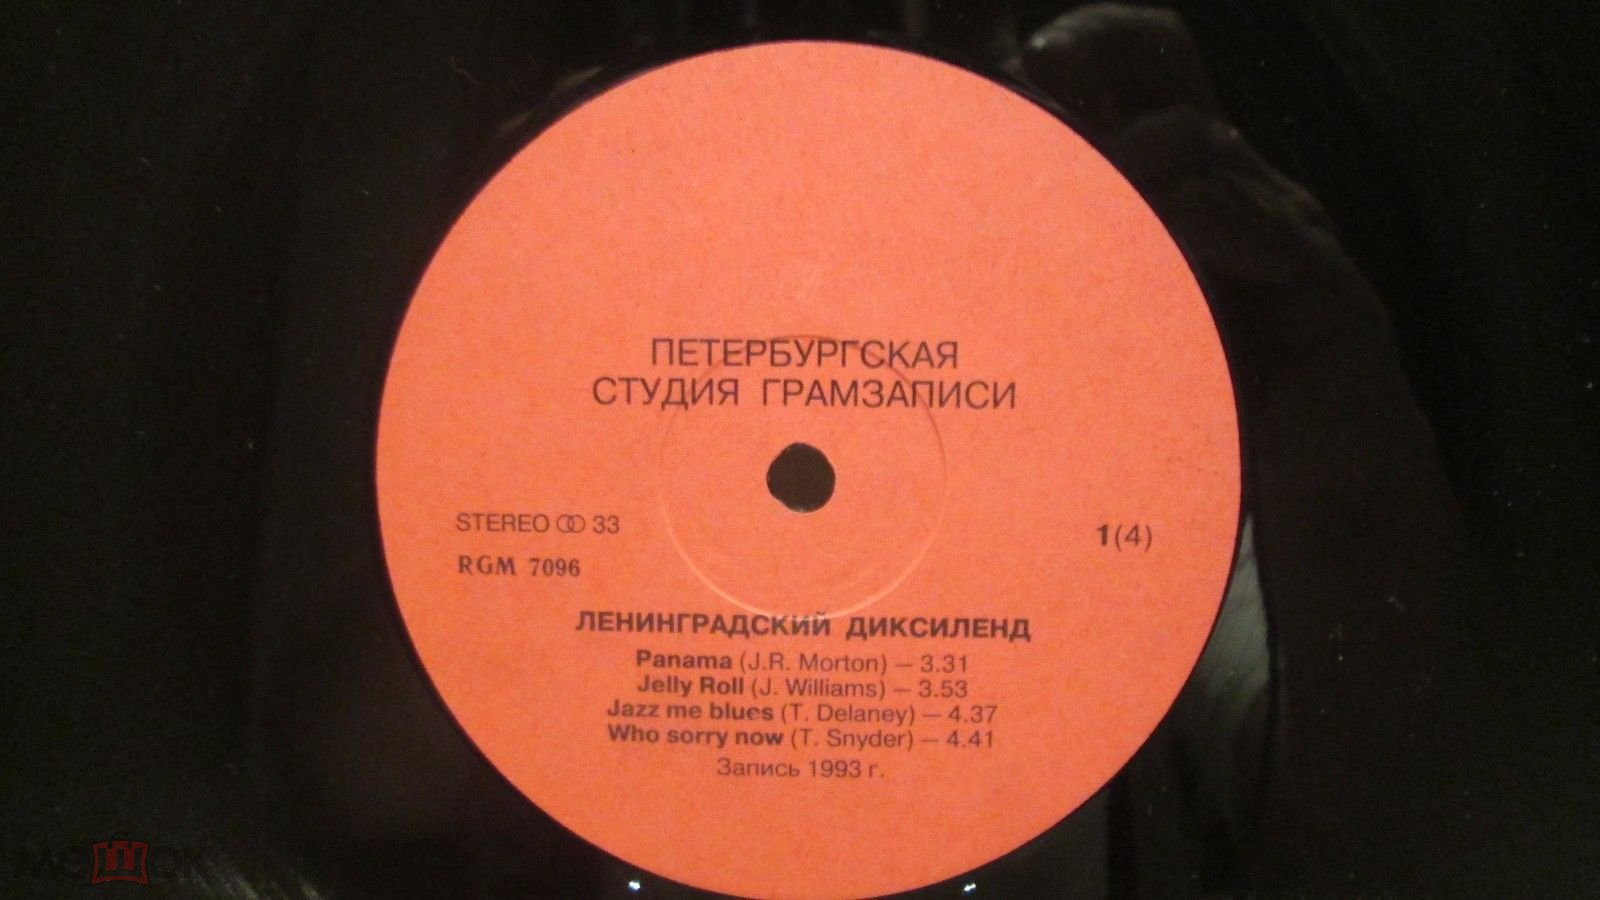 LENINGRAD DIXIELAND Ленинградский Диксиленд 2LP 1993